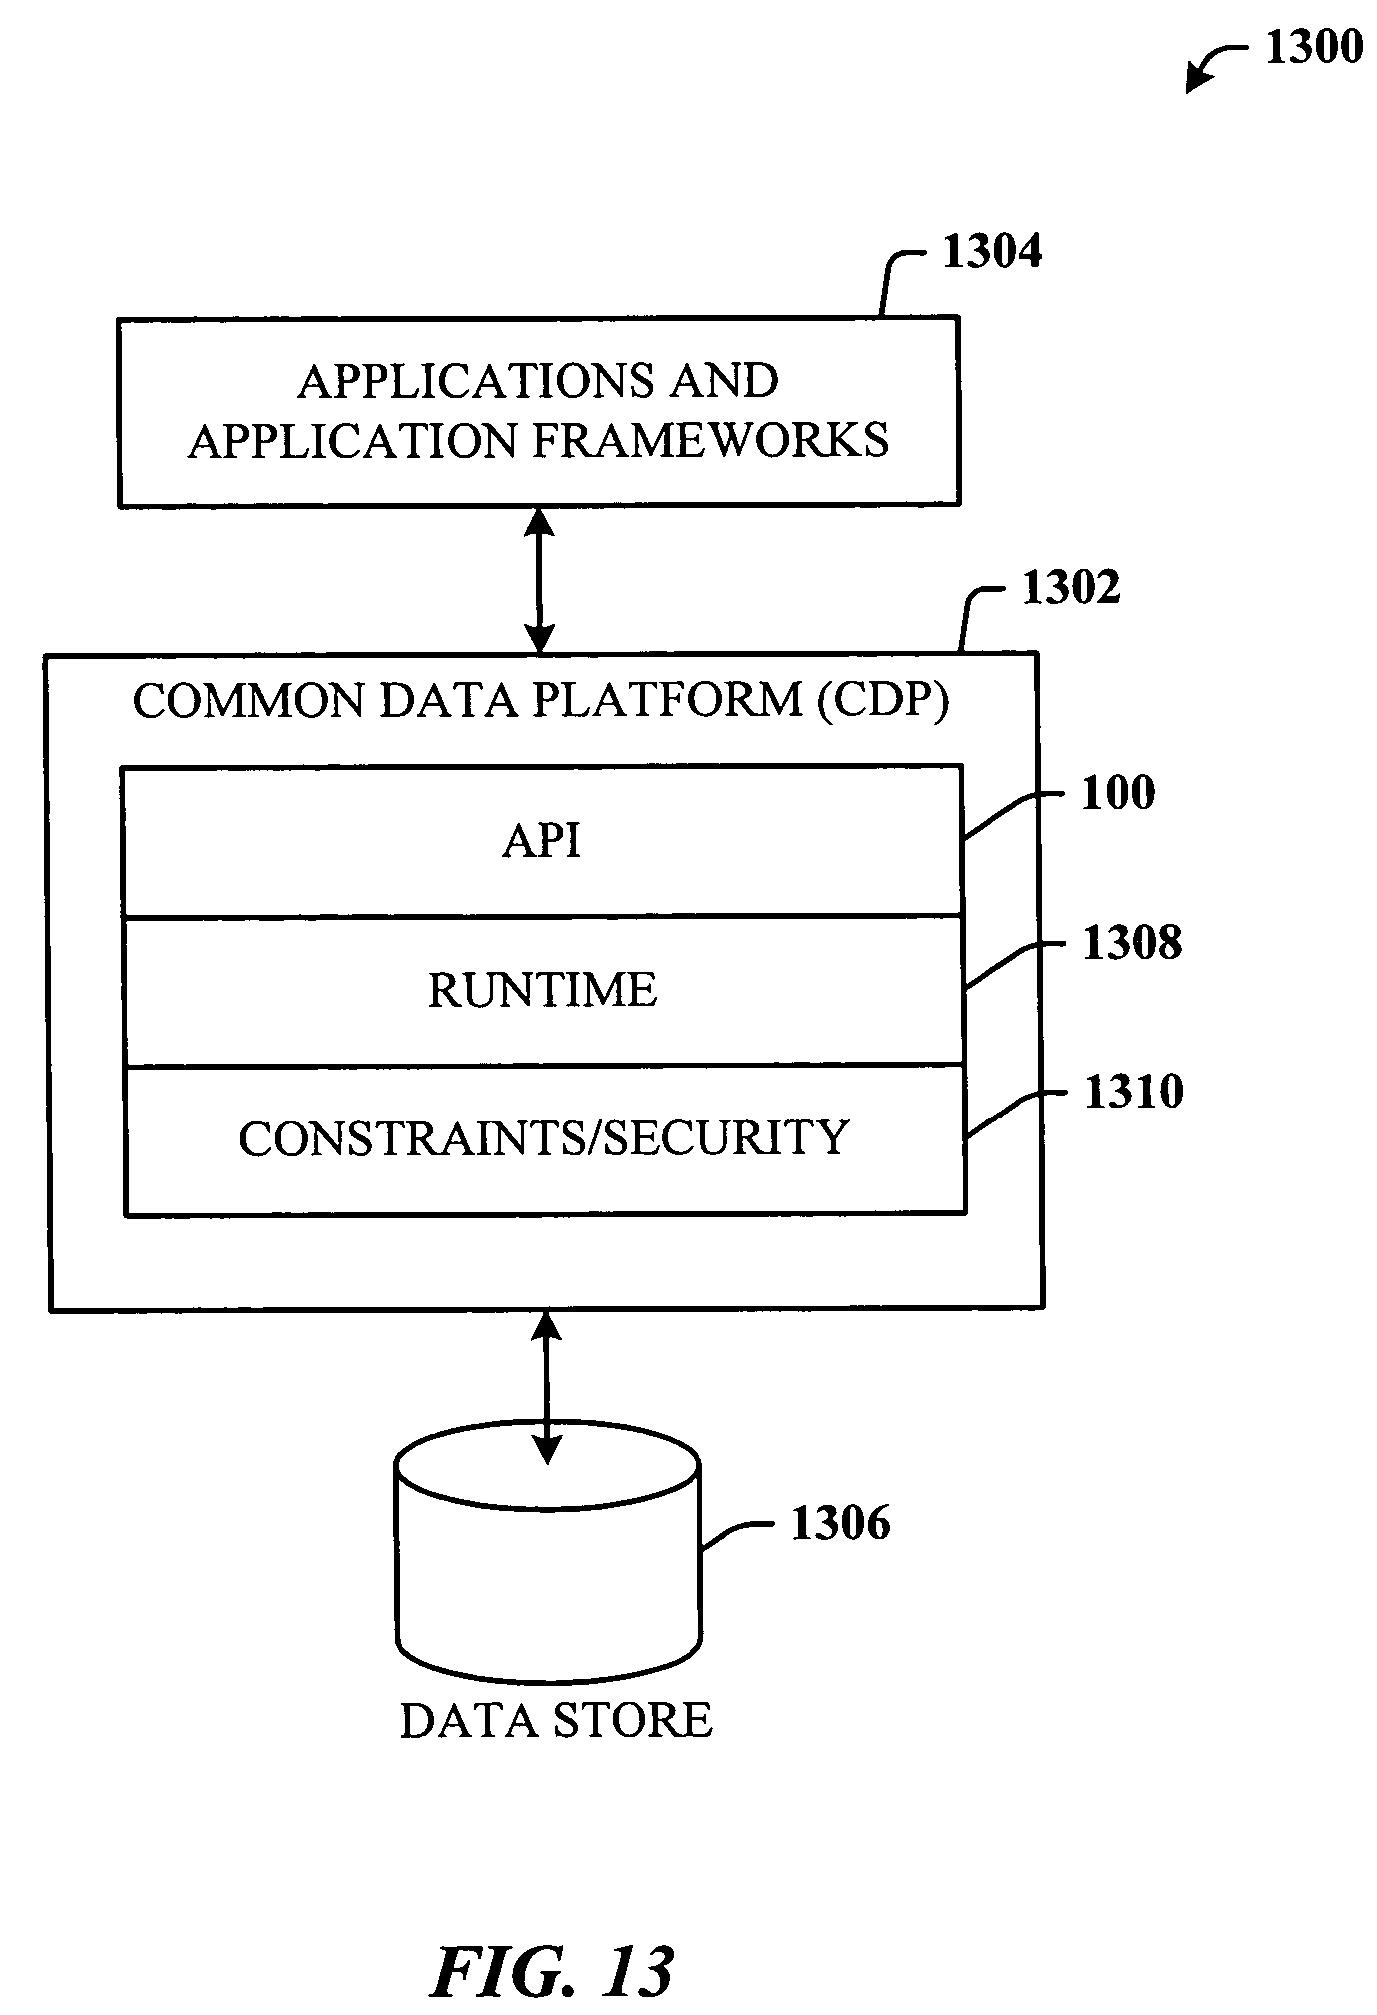 common data model and api relationship